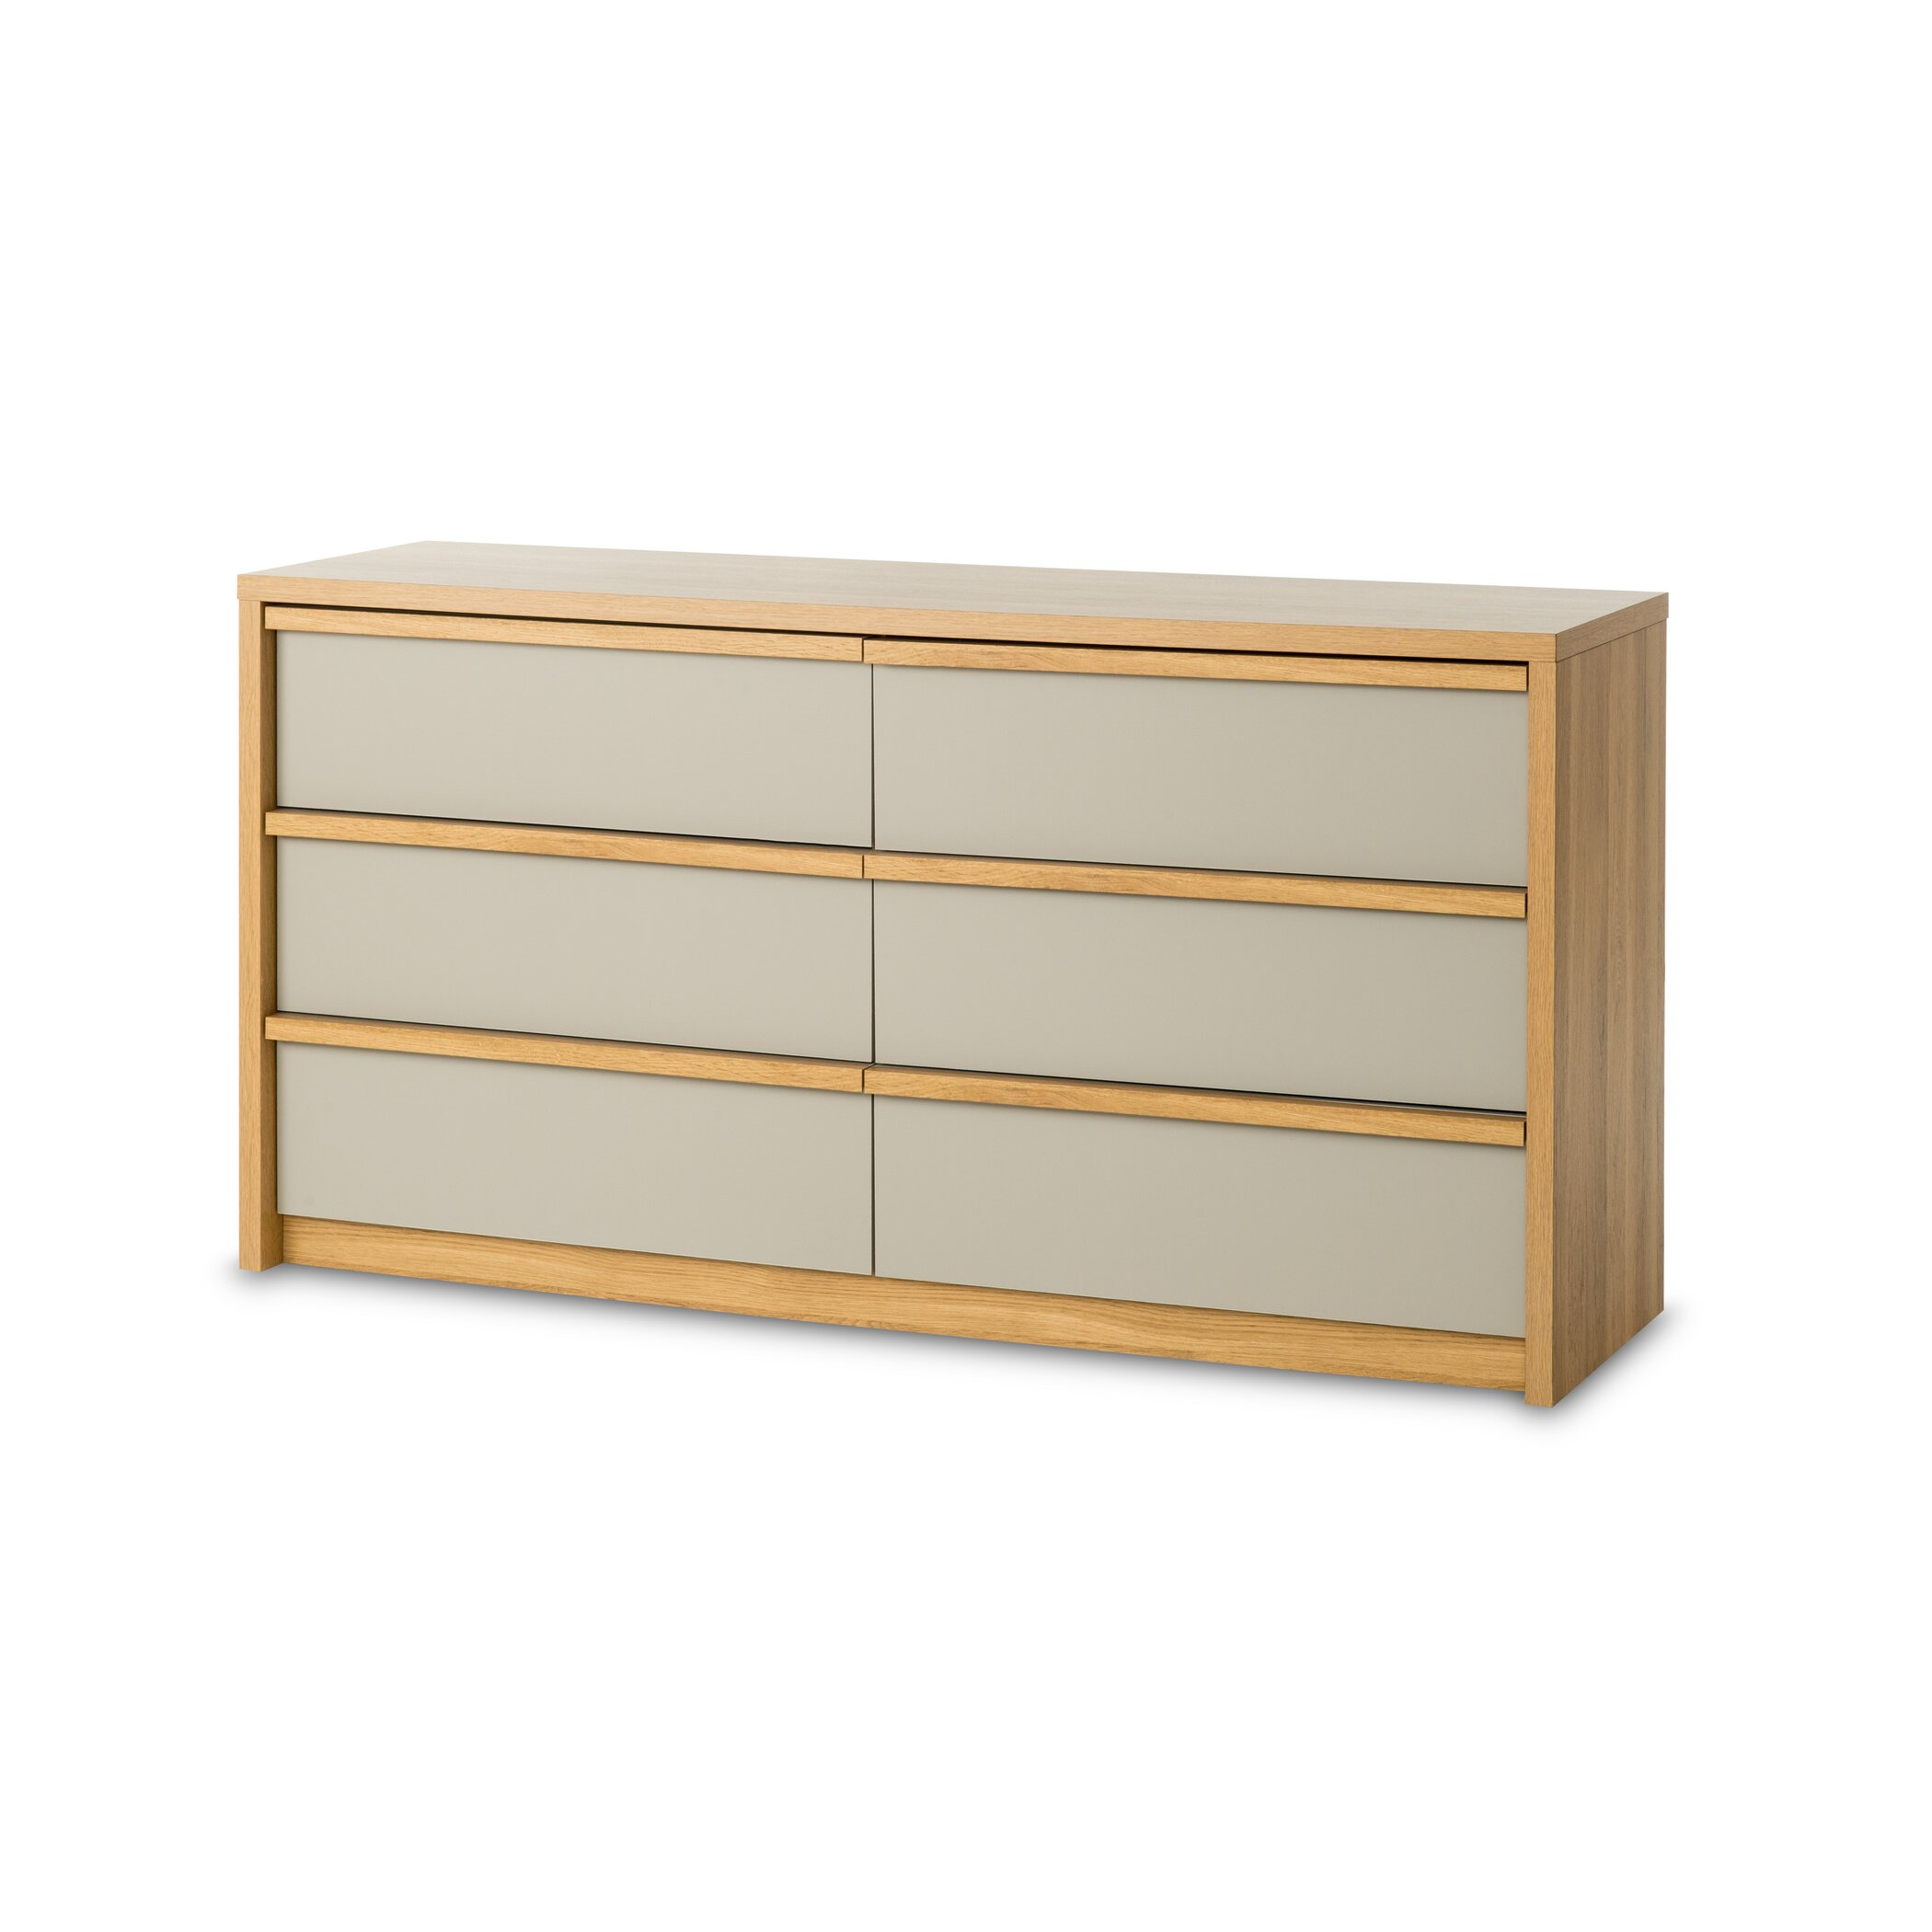 Child craft loft 6 drawer dresser reviews wayfair for Ready to assemble bedroom furniture